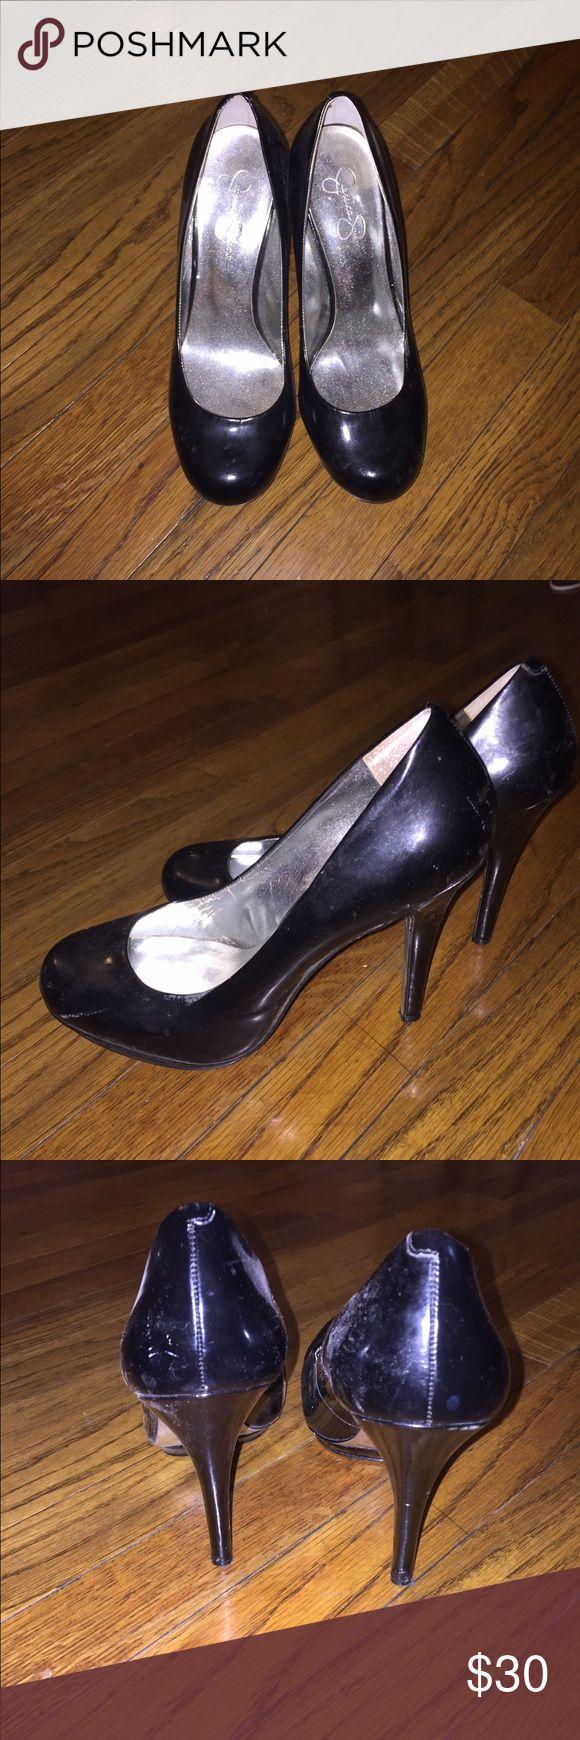 Jessica Simpson patent leather round toe pumps Jessica Simpson patent leather round toe pumps Jessica Simpson Shoes